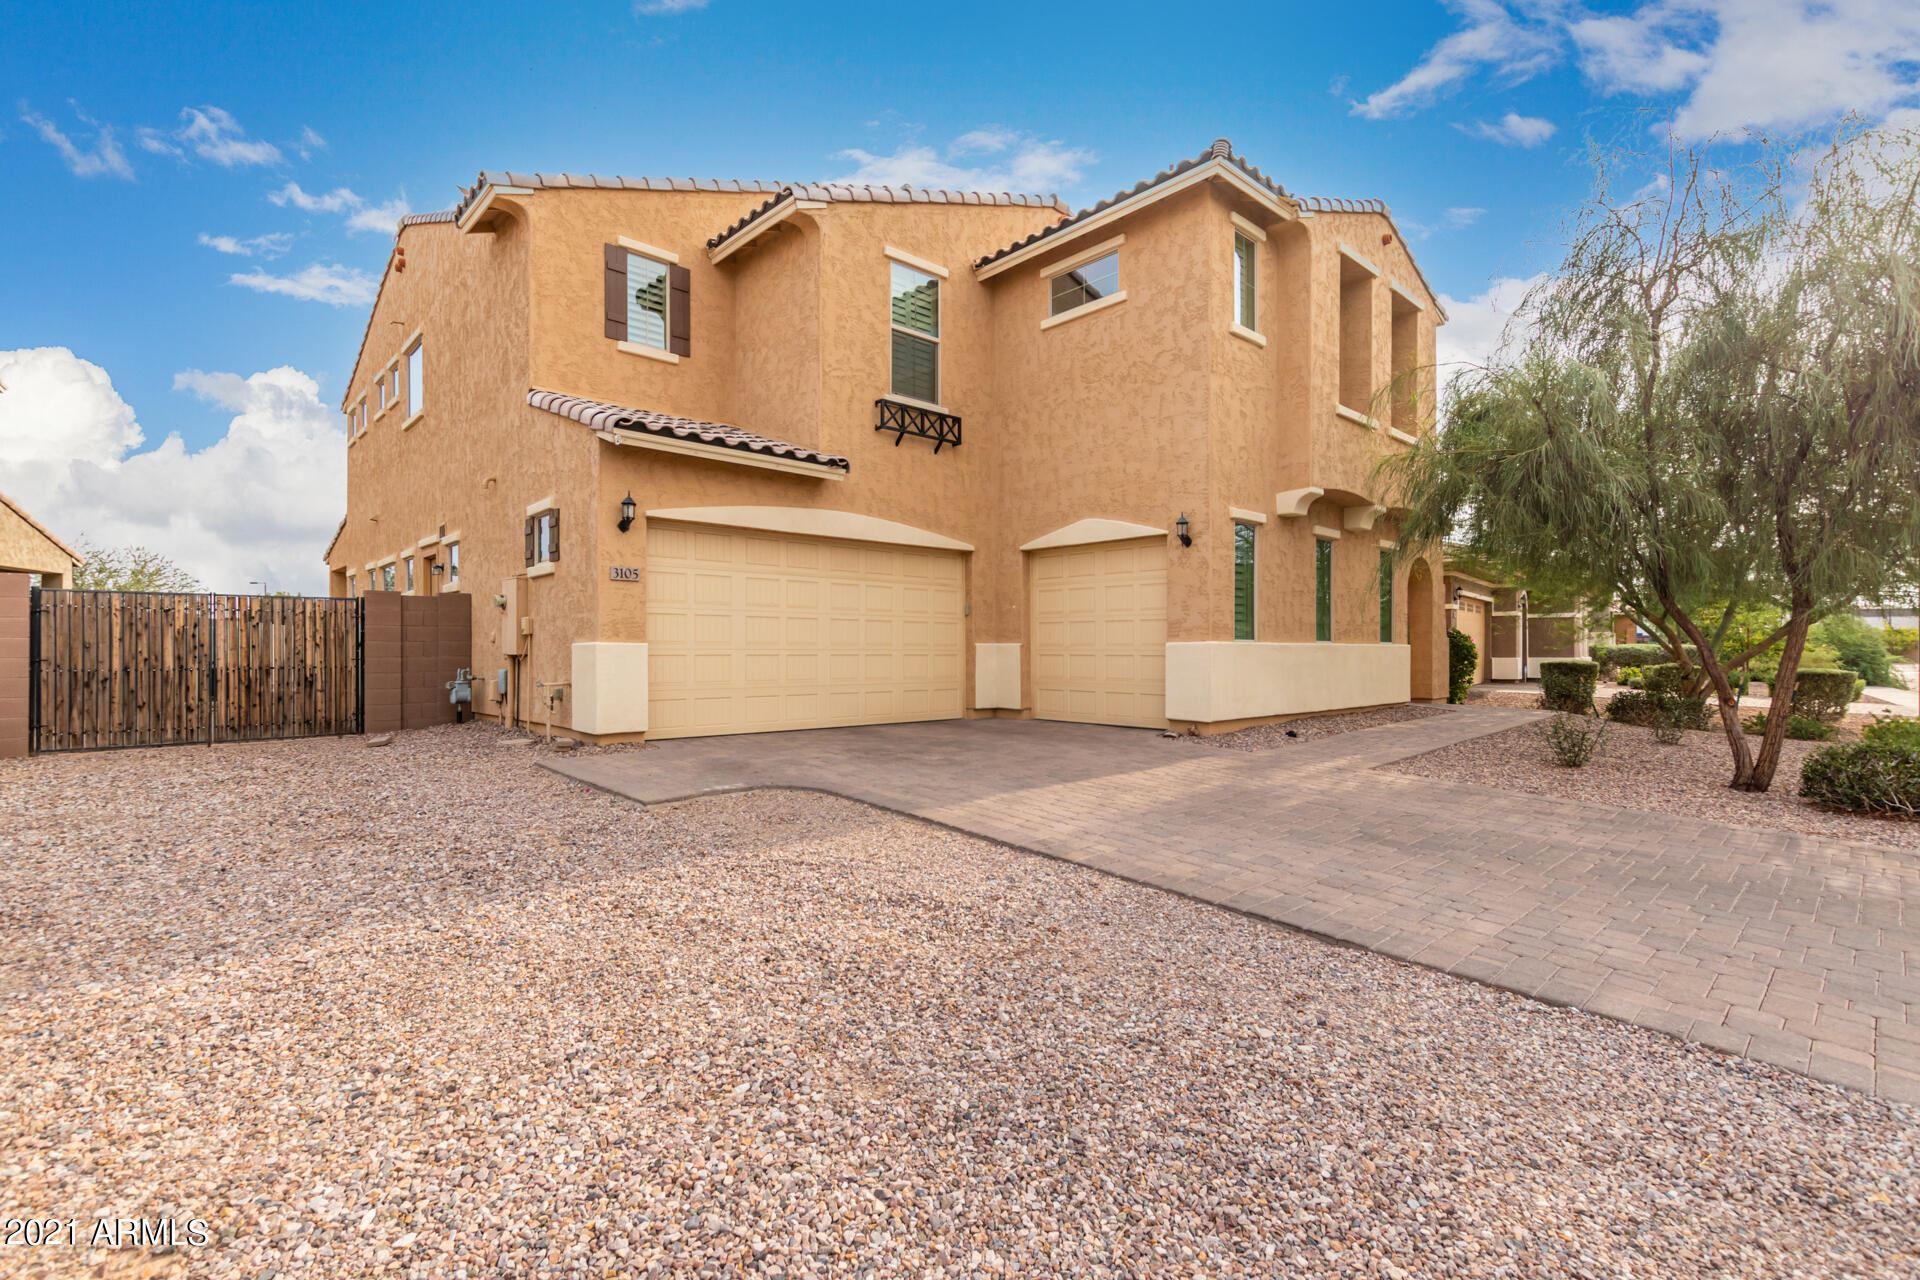 Photo of 3105 E CHERRYWOOD Place, Chandler, AZ 85249 (MLS # 6269010)